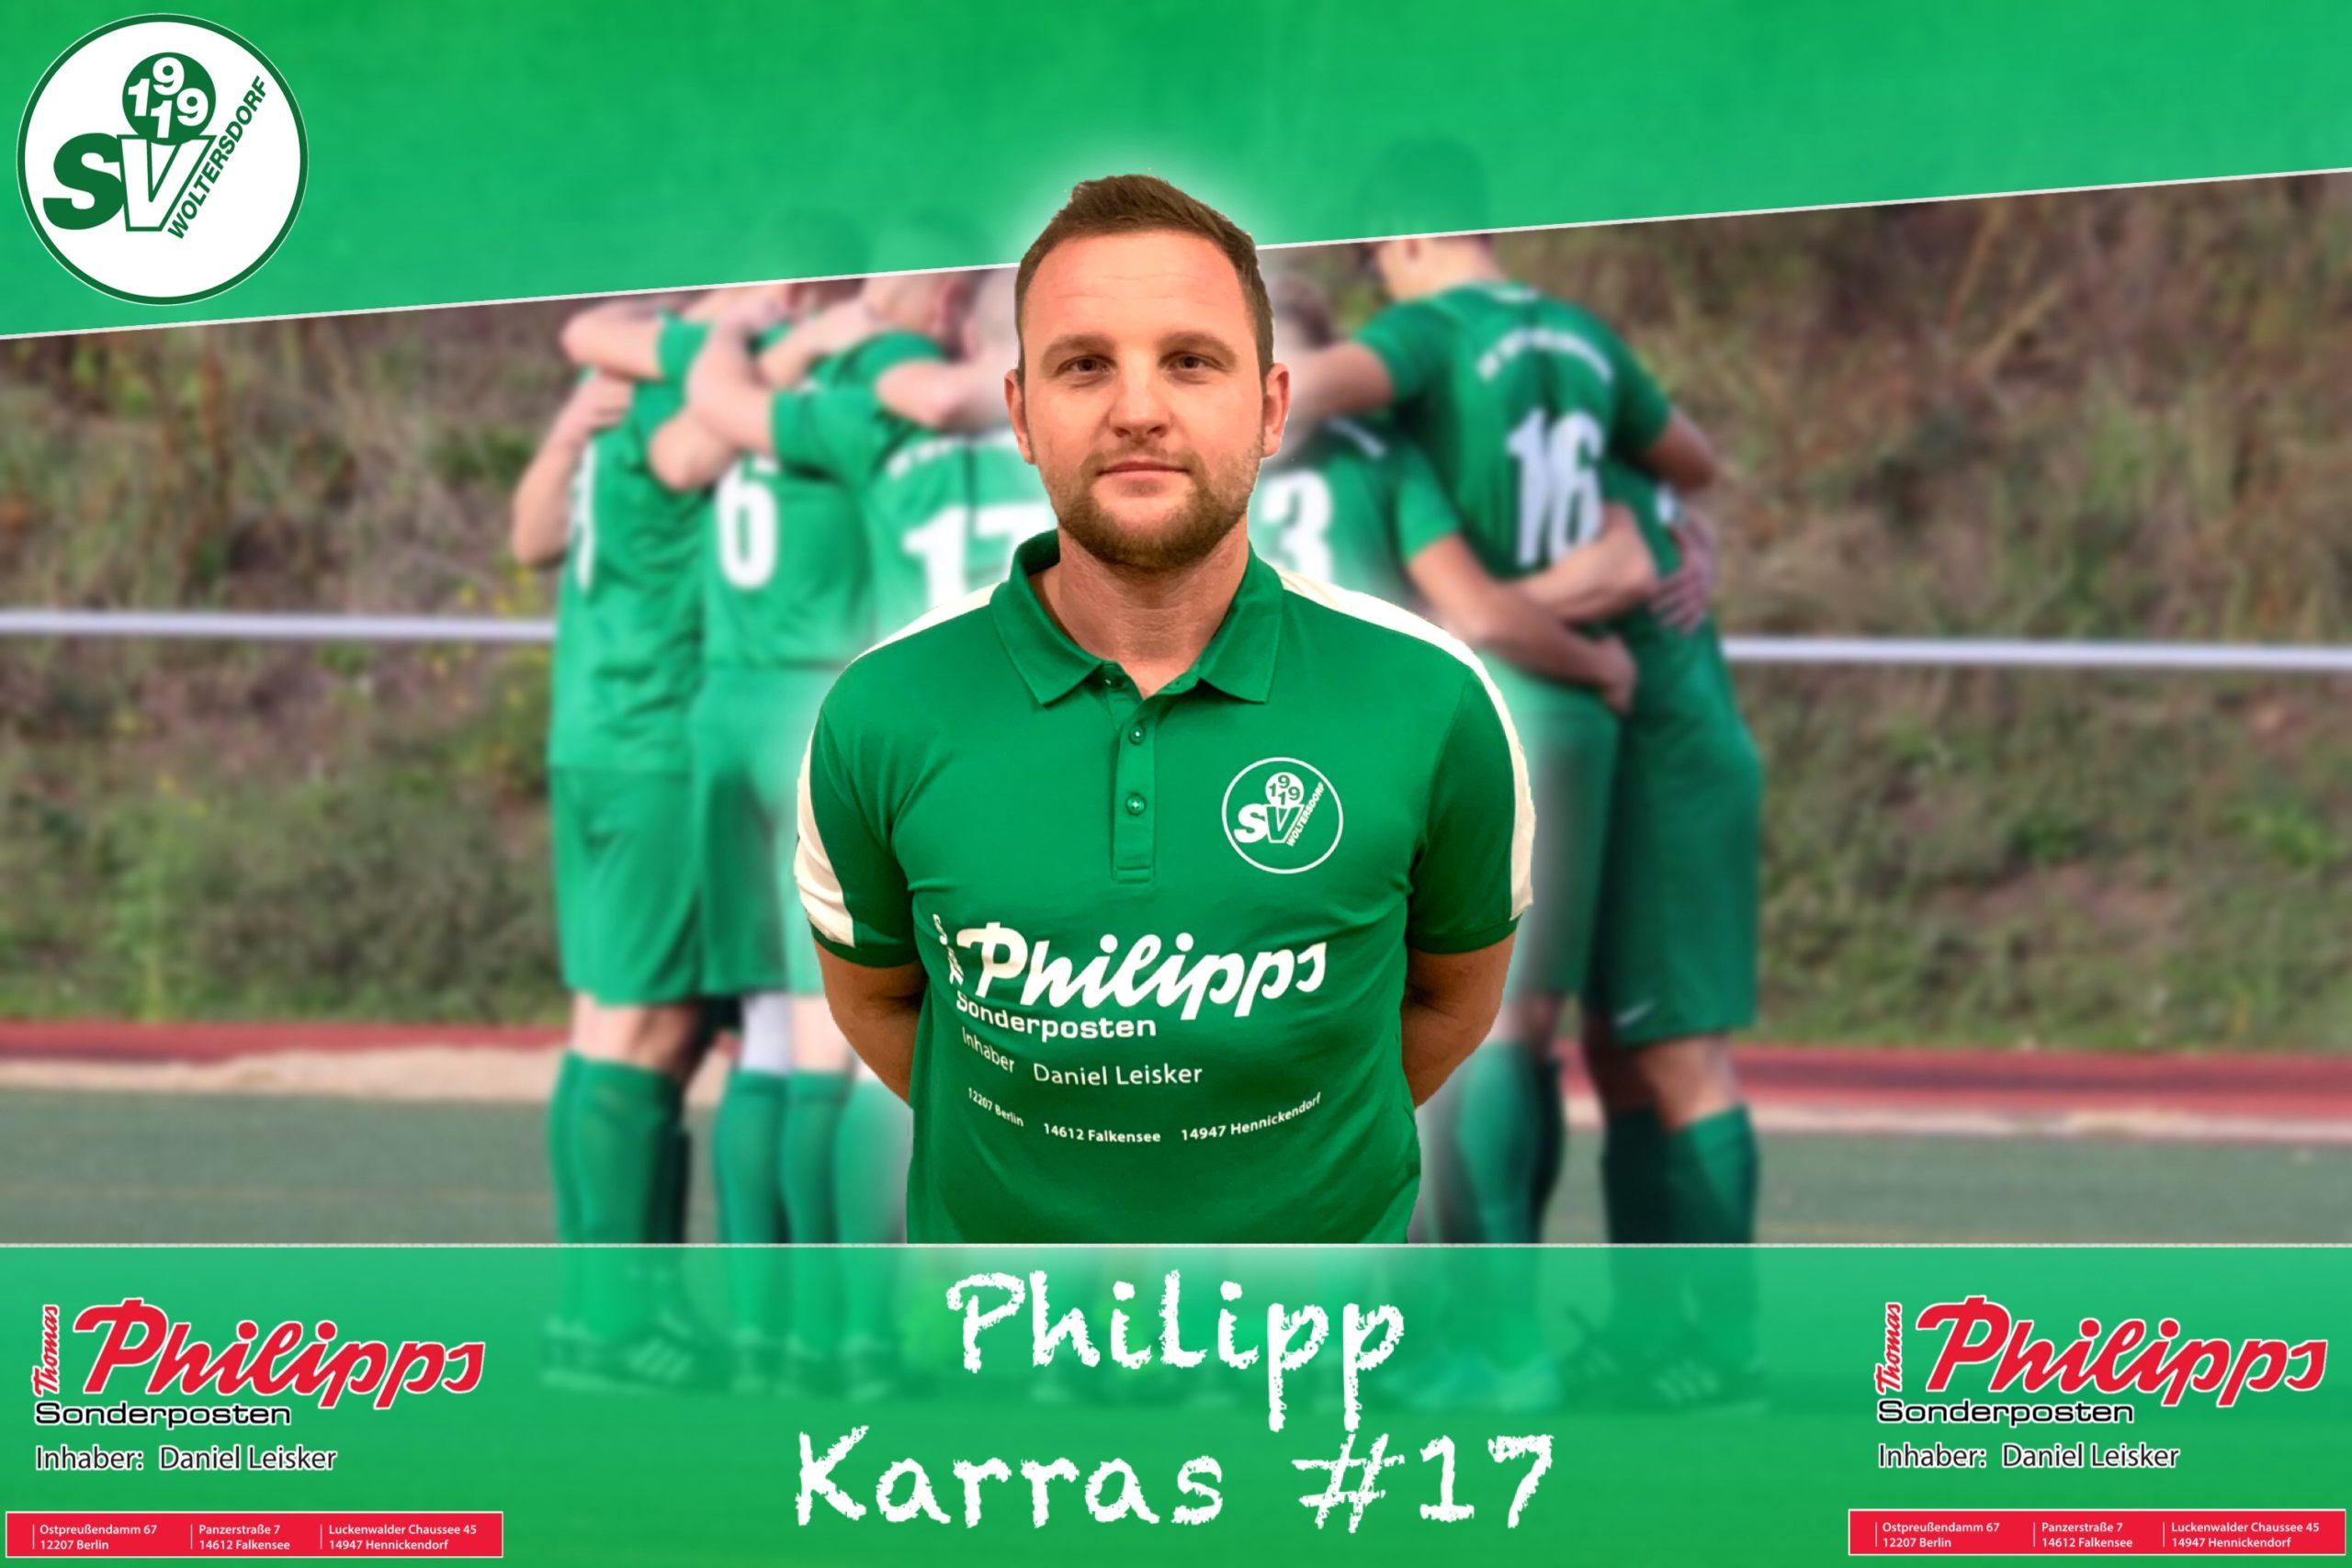 Philipp Karras